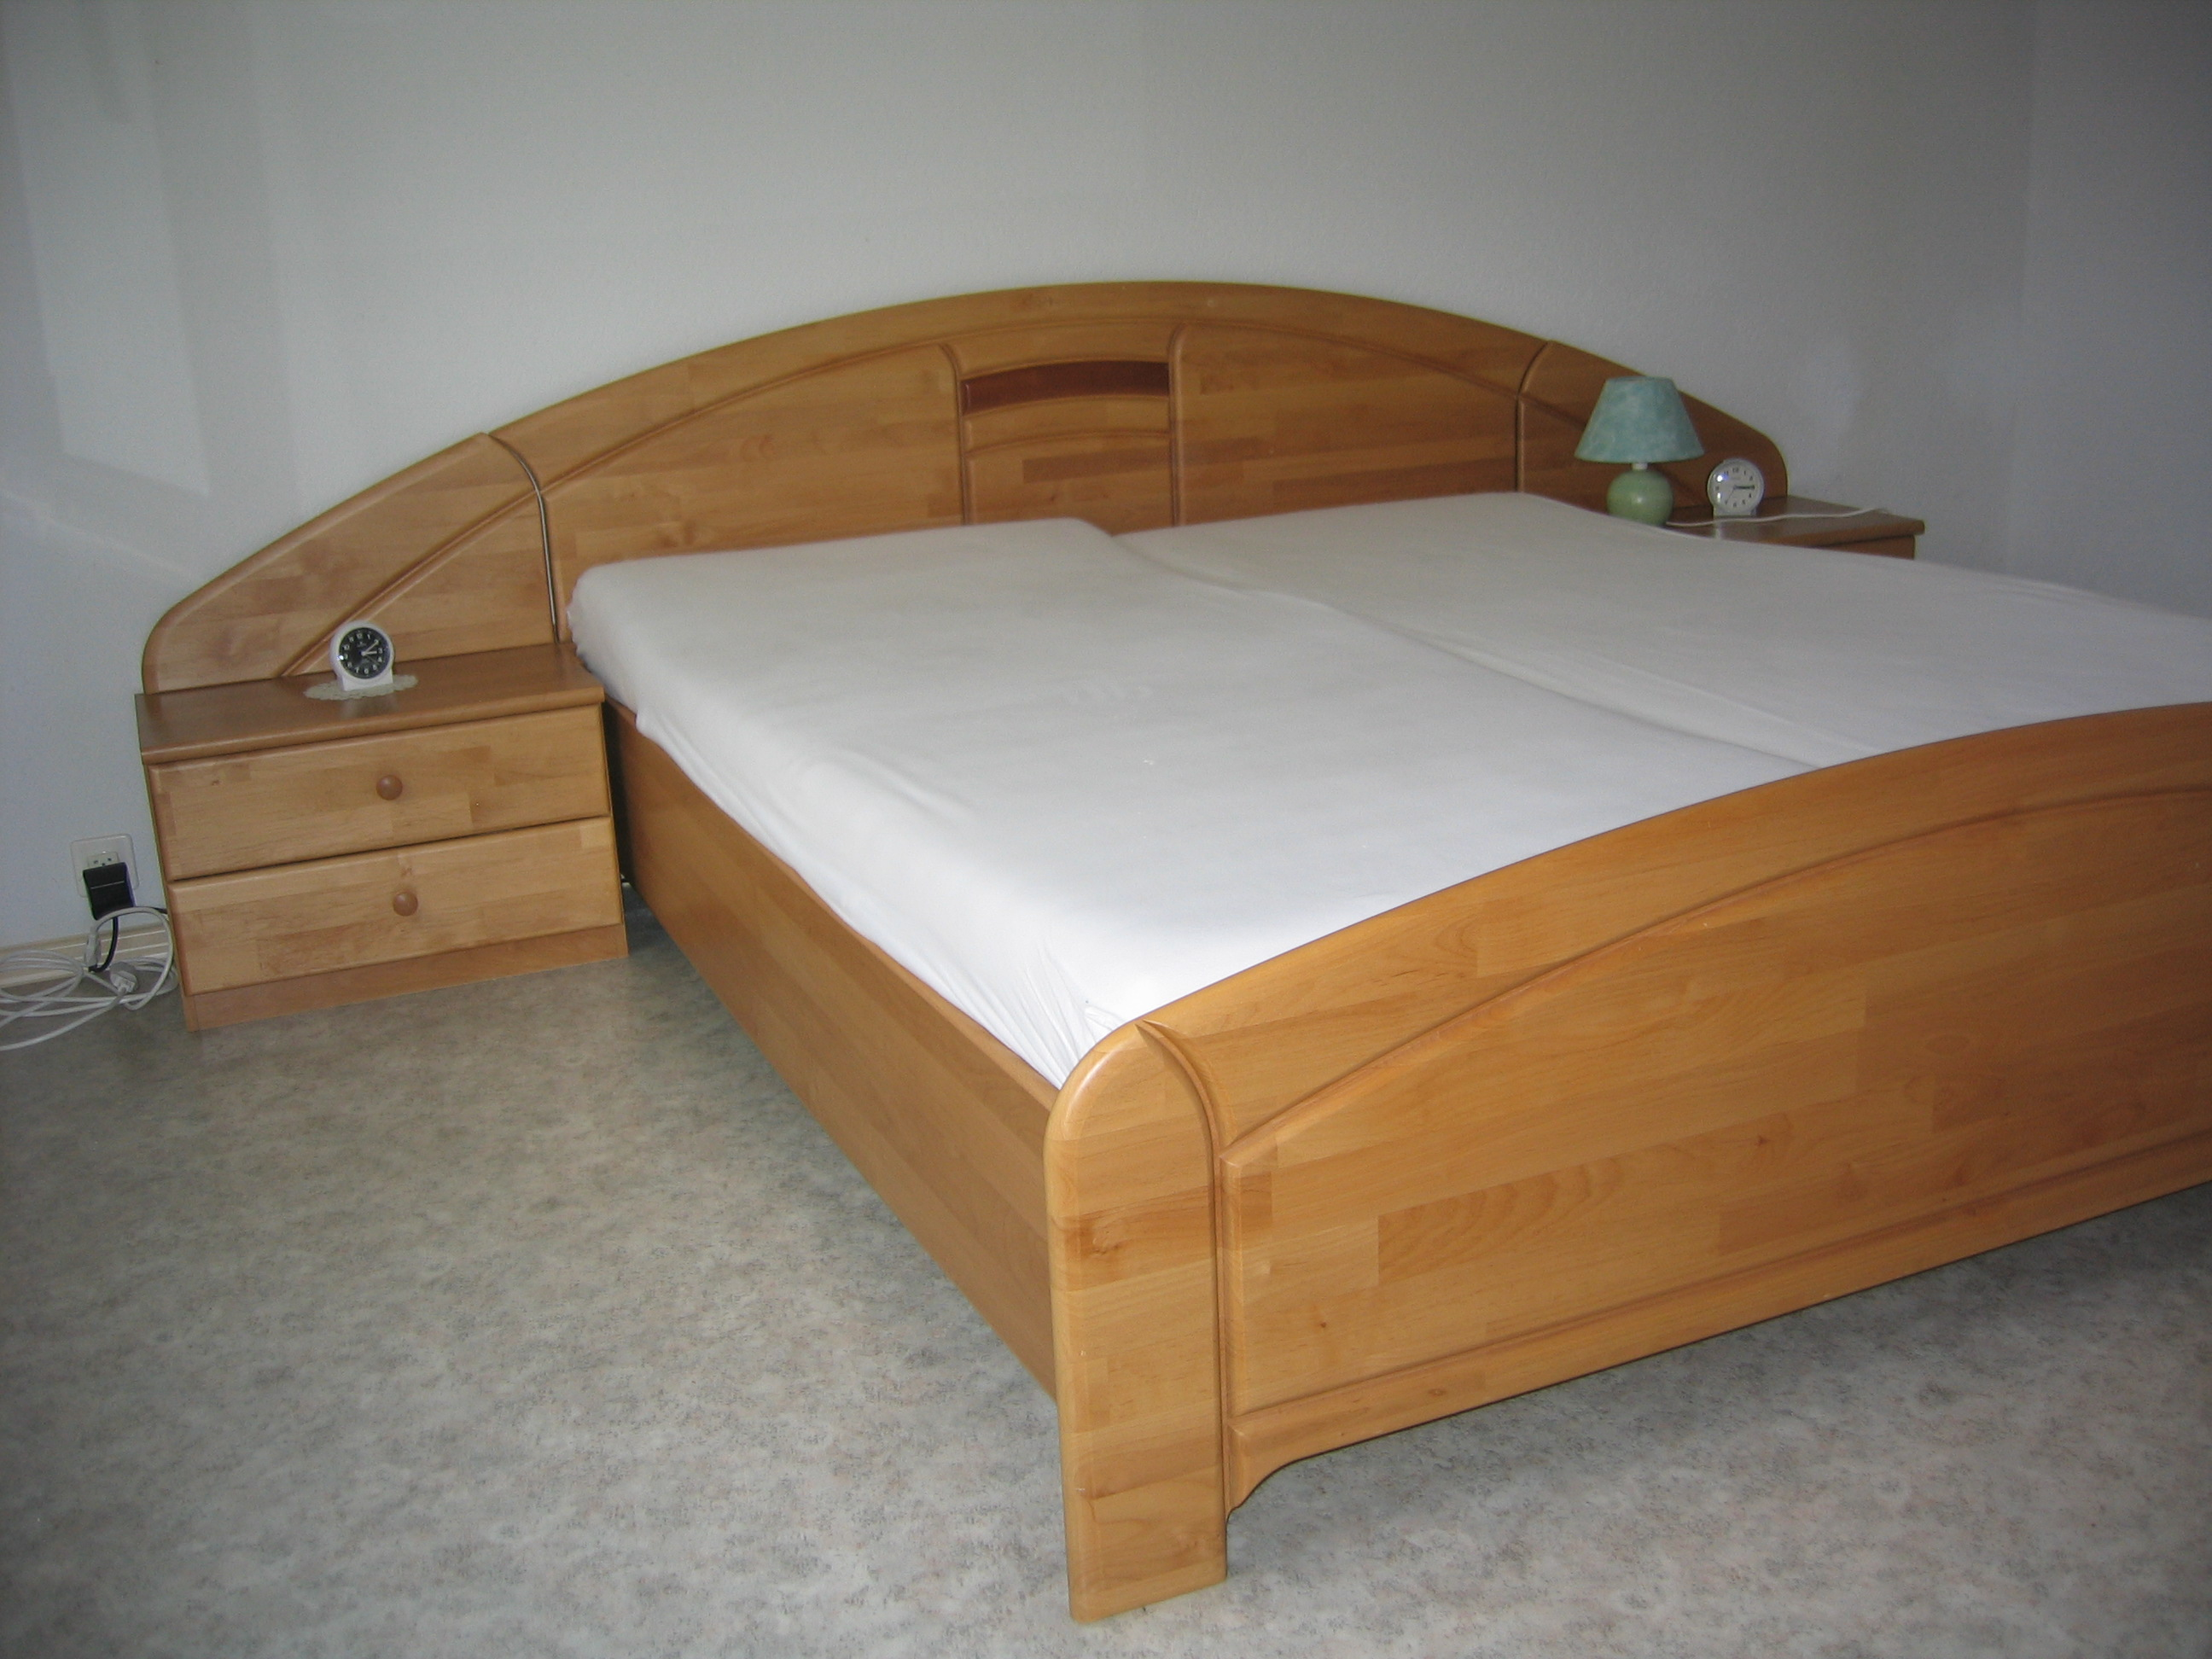 Chambre coucher compl te sur for Acheter chambre a coucher complete